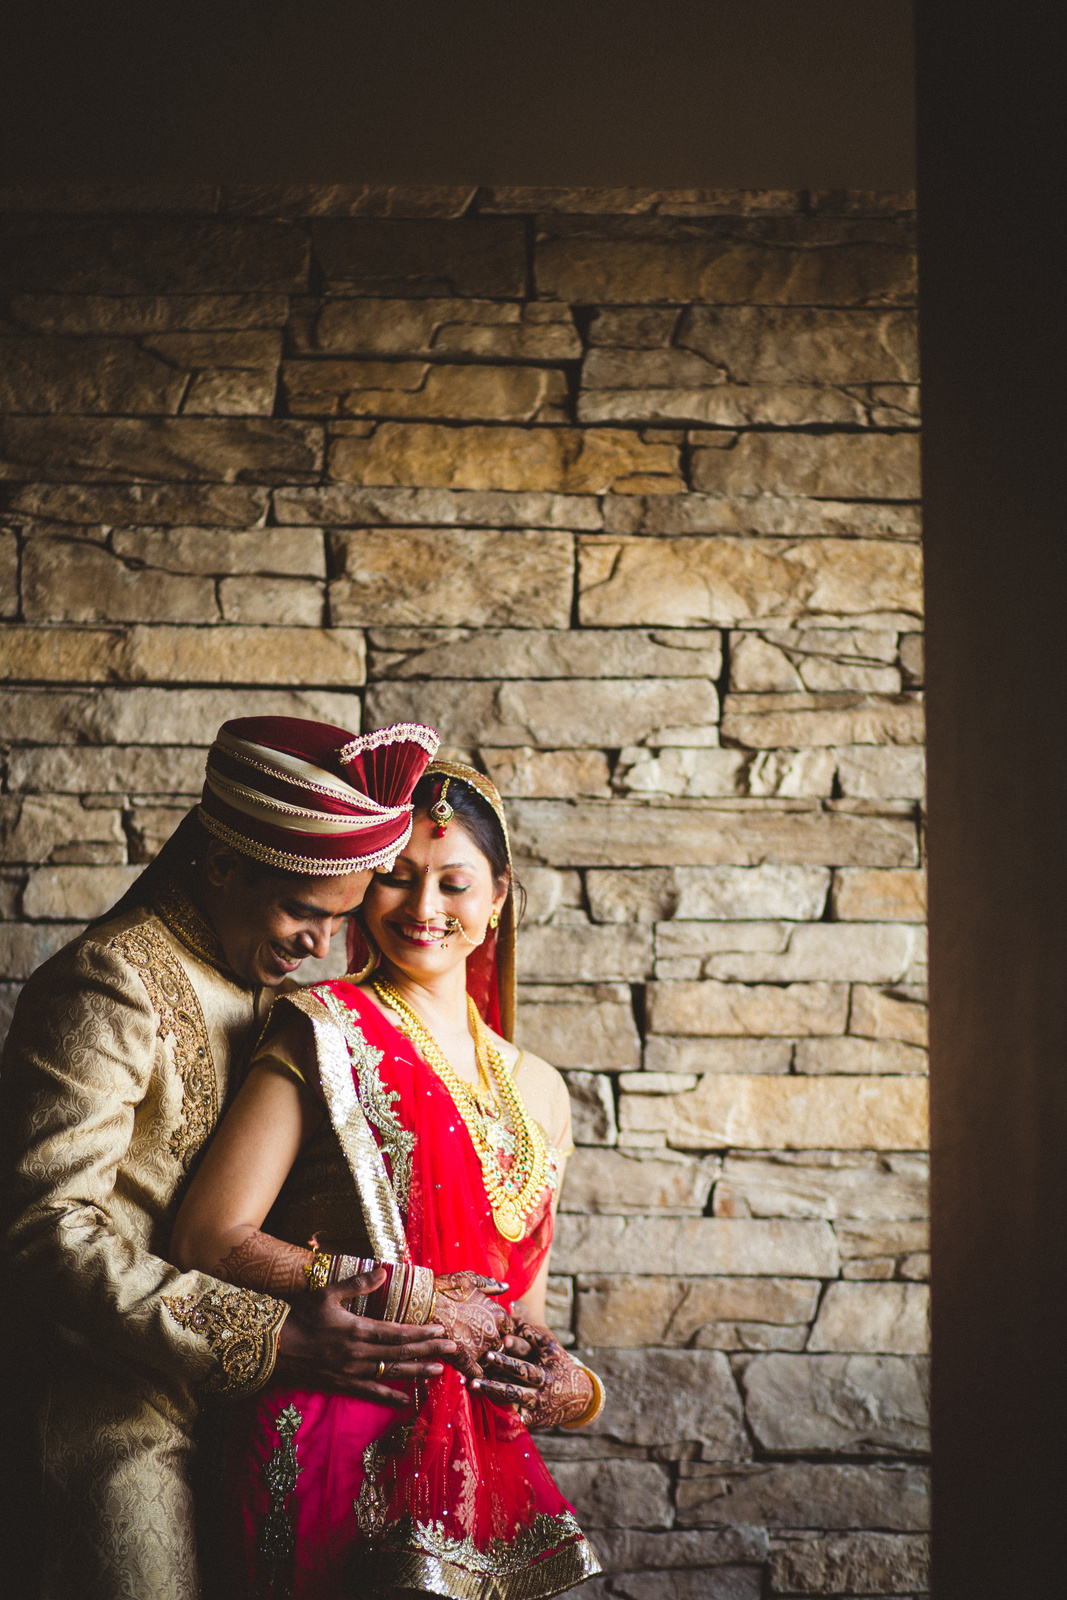 mumbai-candid-wedding-photographer-into-candid-av-45.jpg